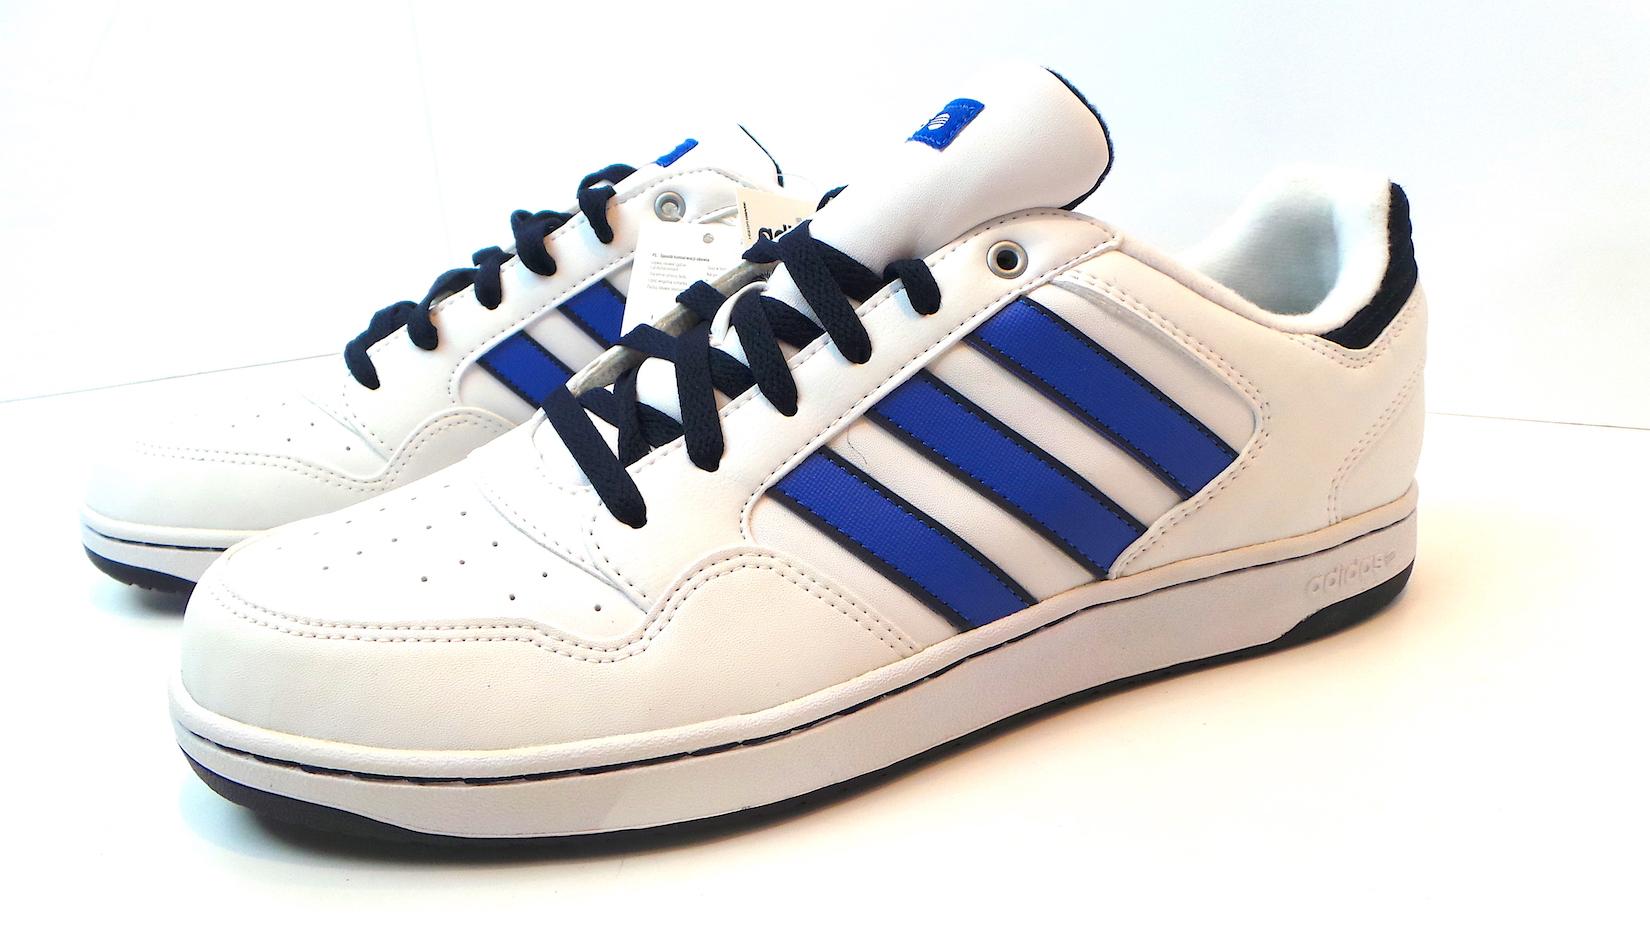 Delpopoloshop Numeri Scarpe adidas In Adidas Grandi Alte Adidas ZqqHdEwT